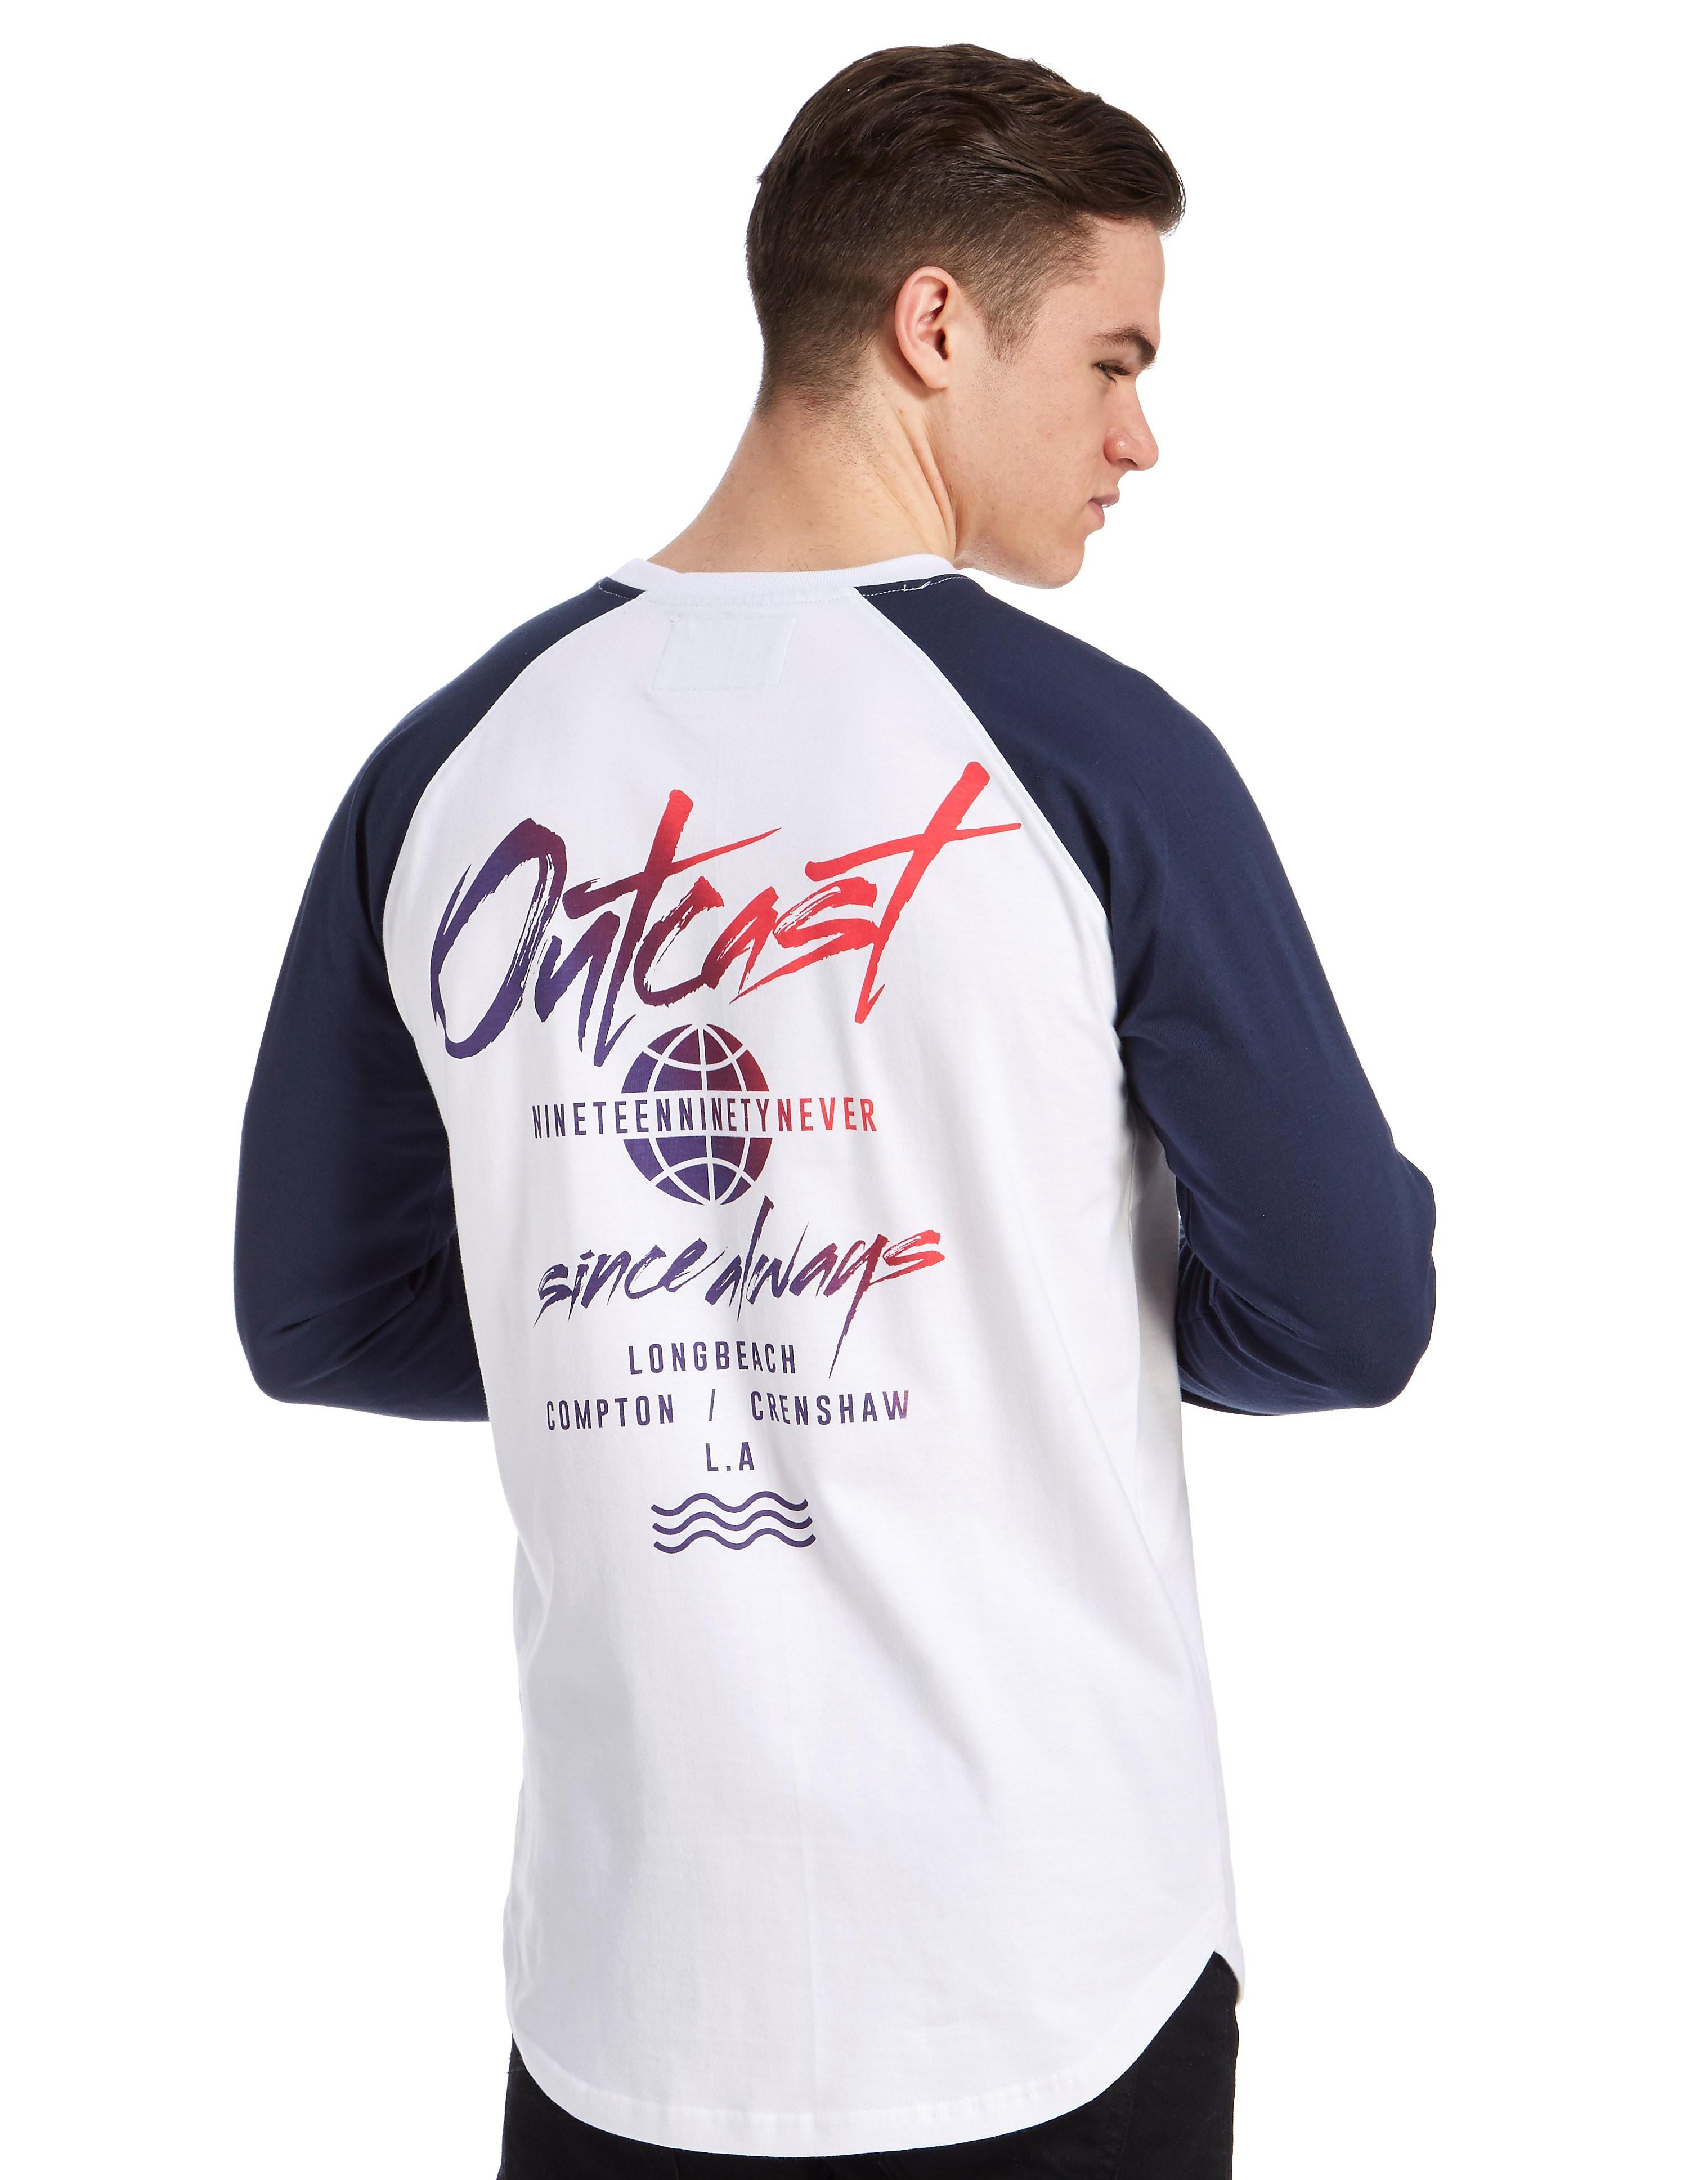 Outcast Sink Or Swim Longsleeve T-Shirt